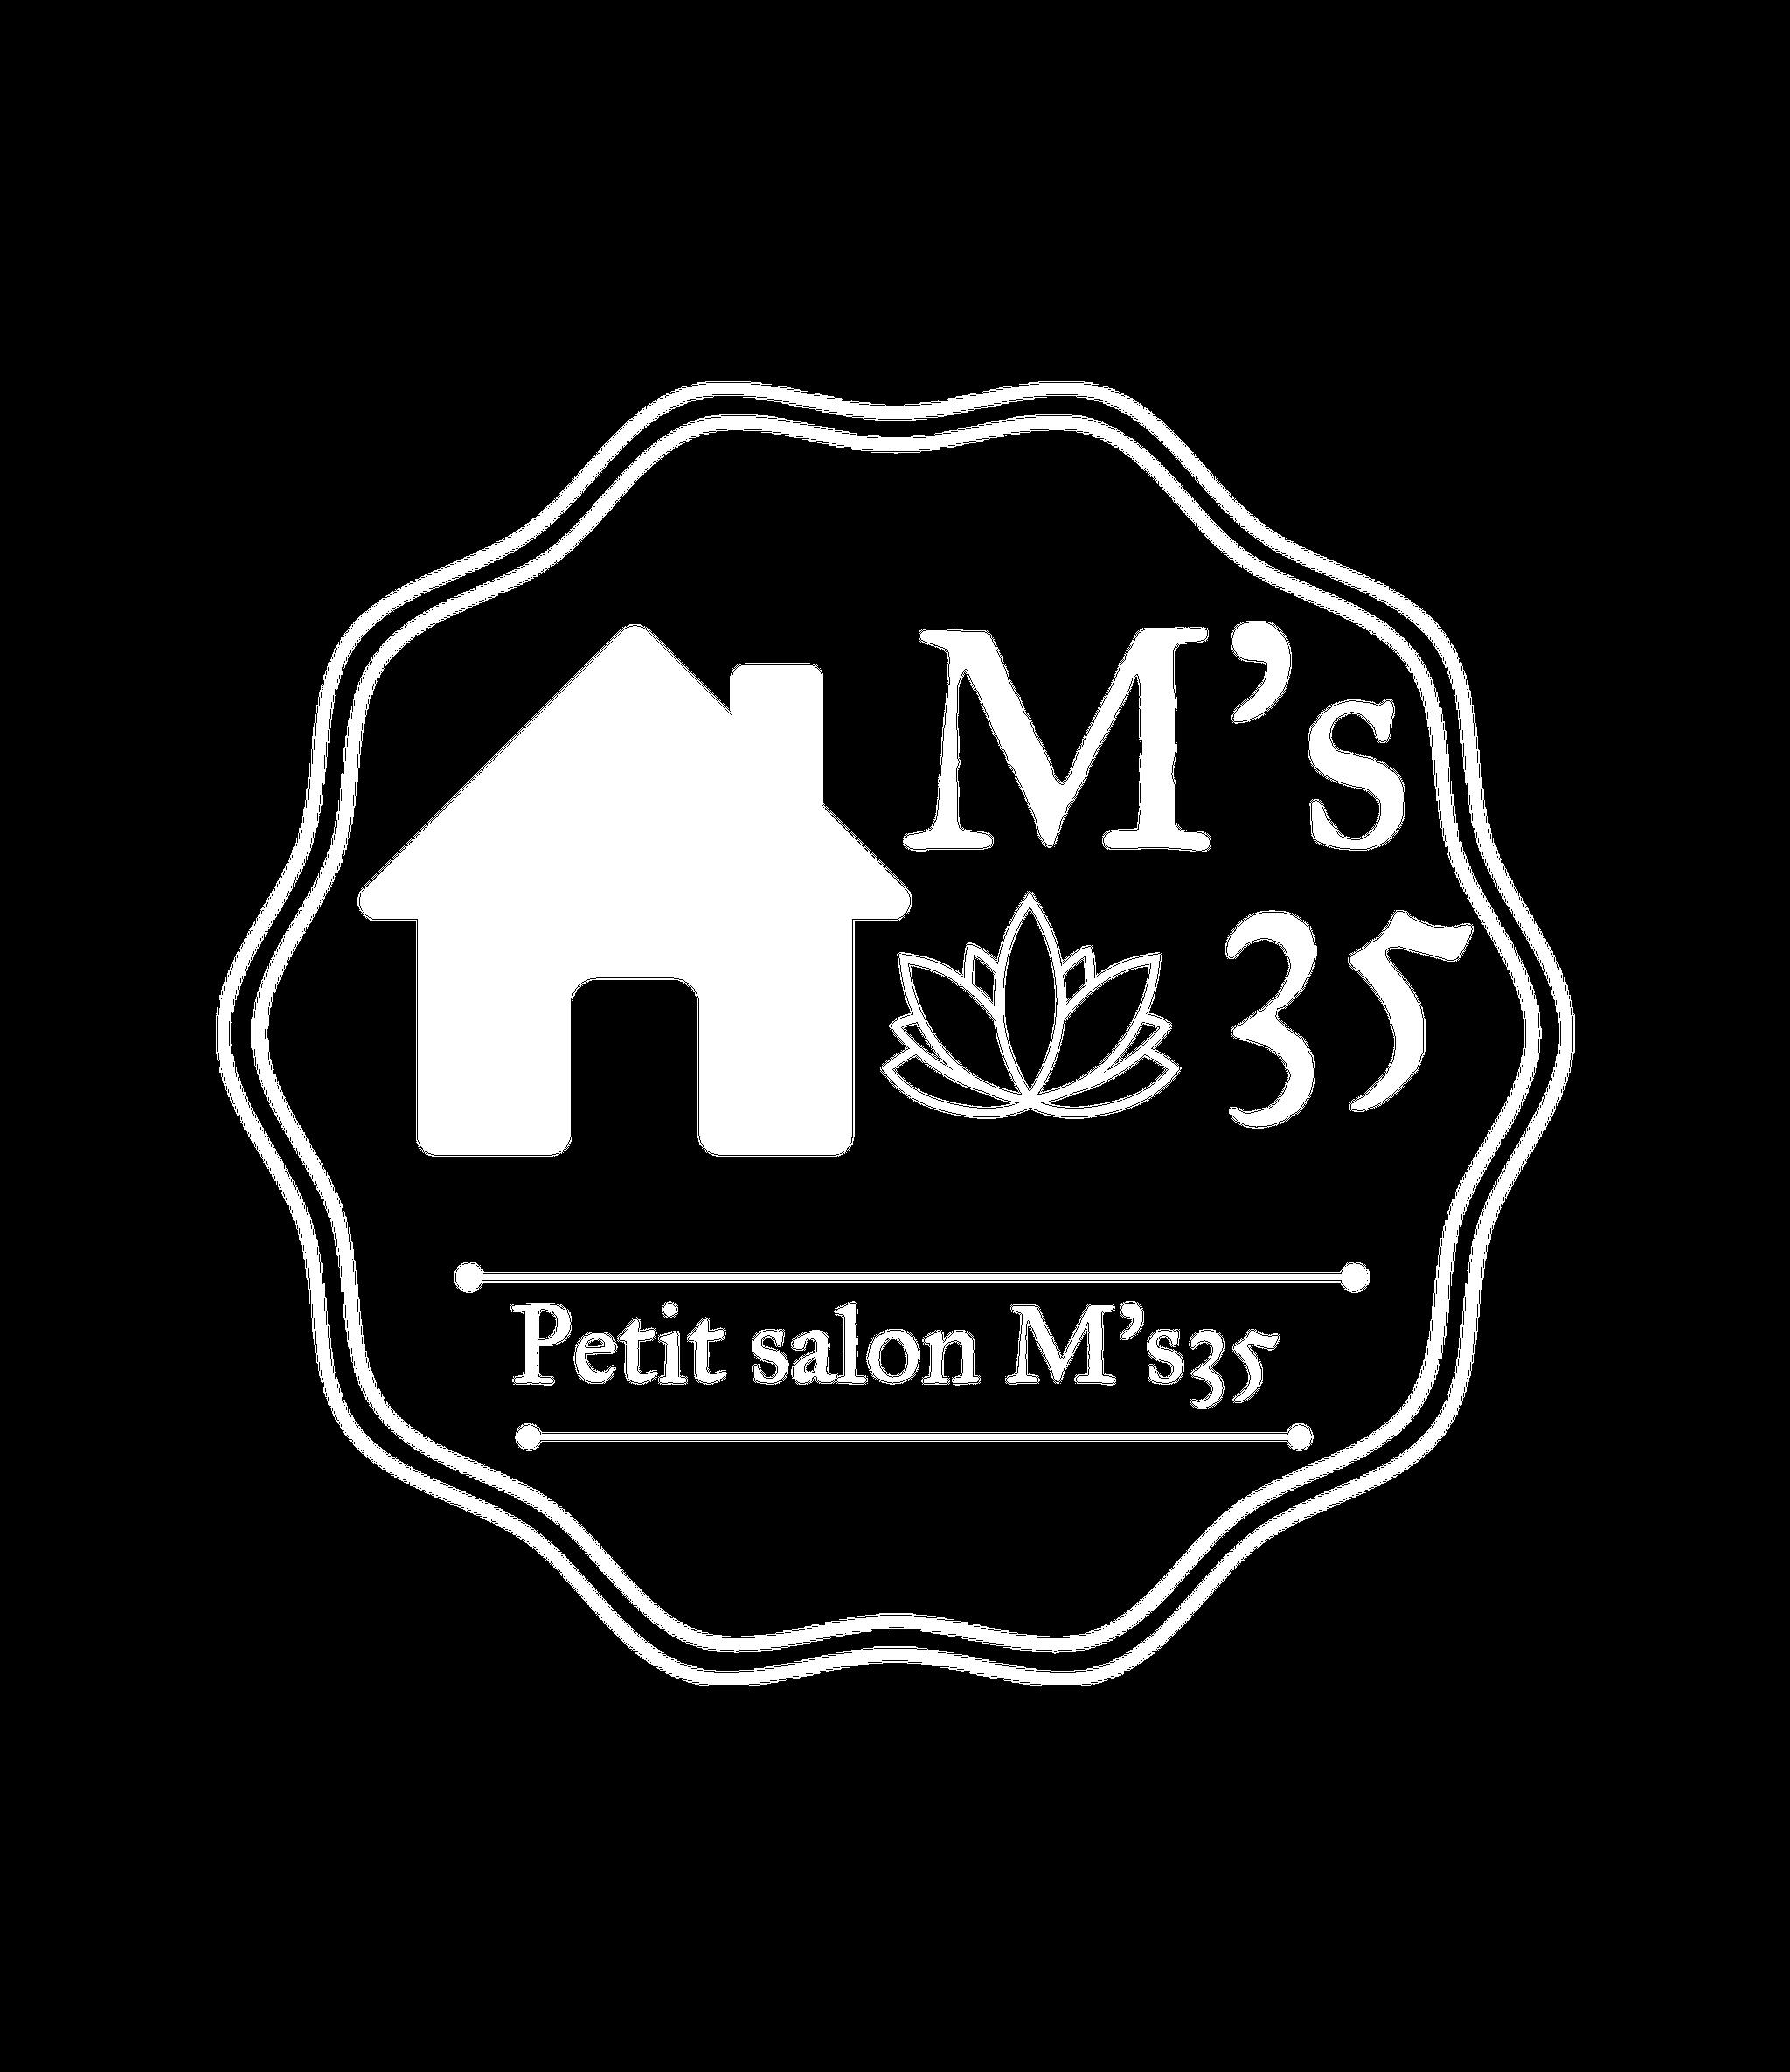 Petit salon  M's35